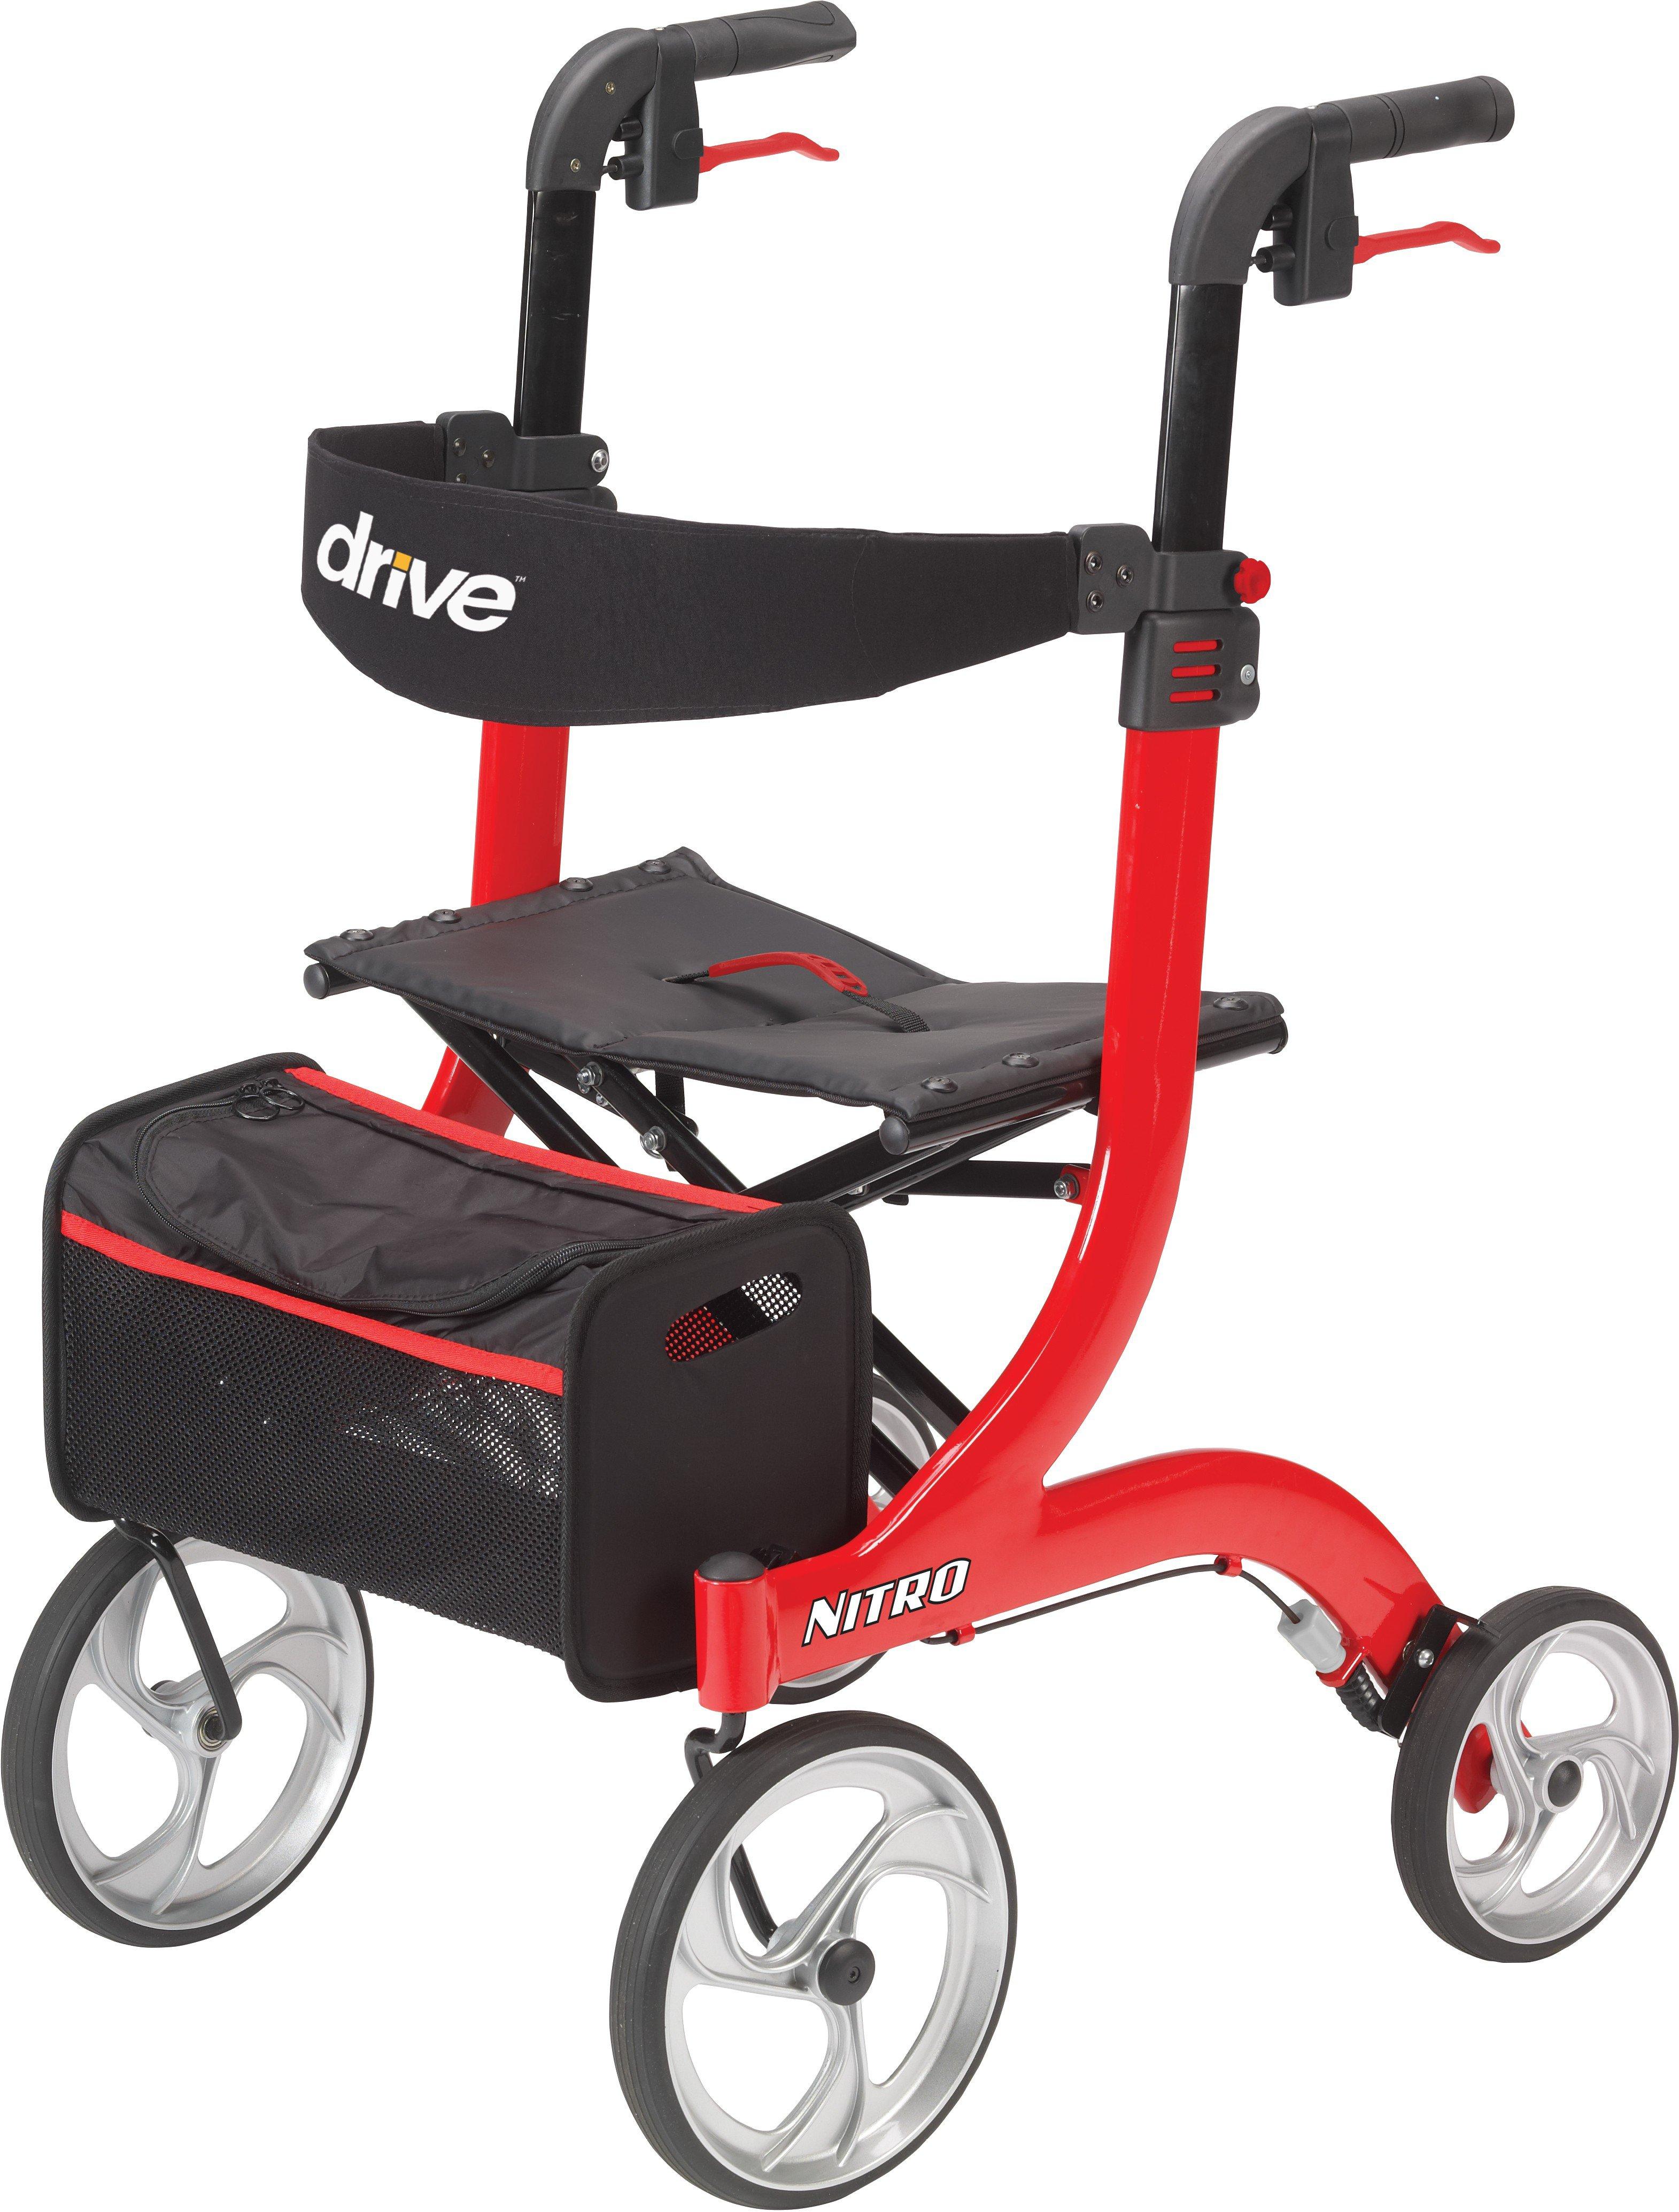 "drive Nitro 4 Wheel Rollator Adjustable Height, Aluminum Frame, RTL10266, 33.5-38.75"" Height Red - 1 Each"